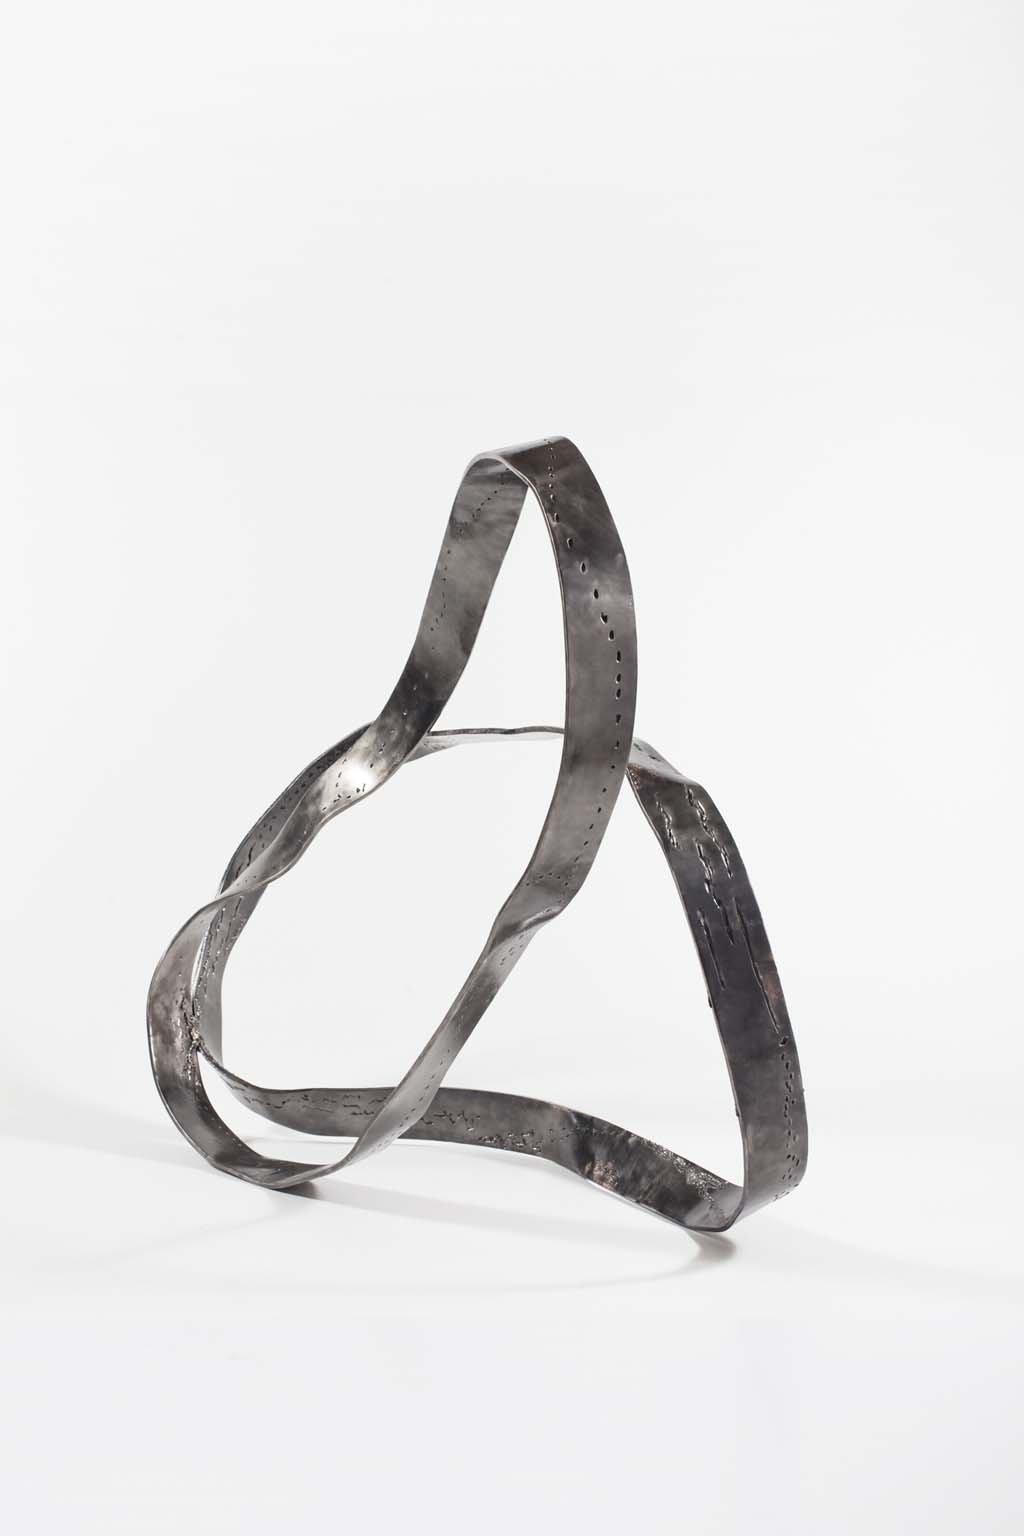 Oblivion I | 2015 | Iron & brass Sculpture | 95x110x50 cm | Rami Ater